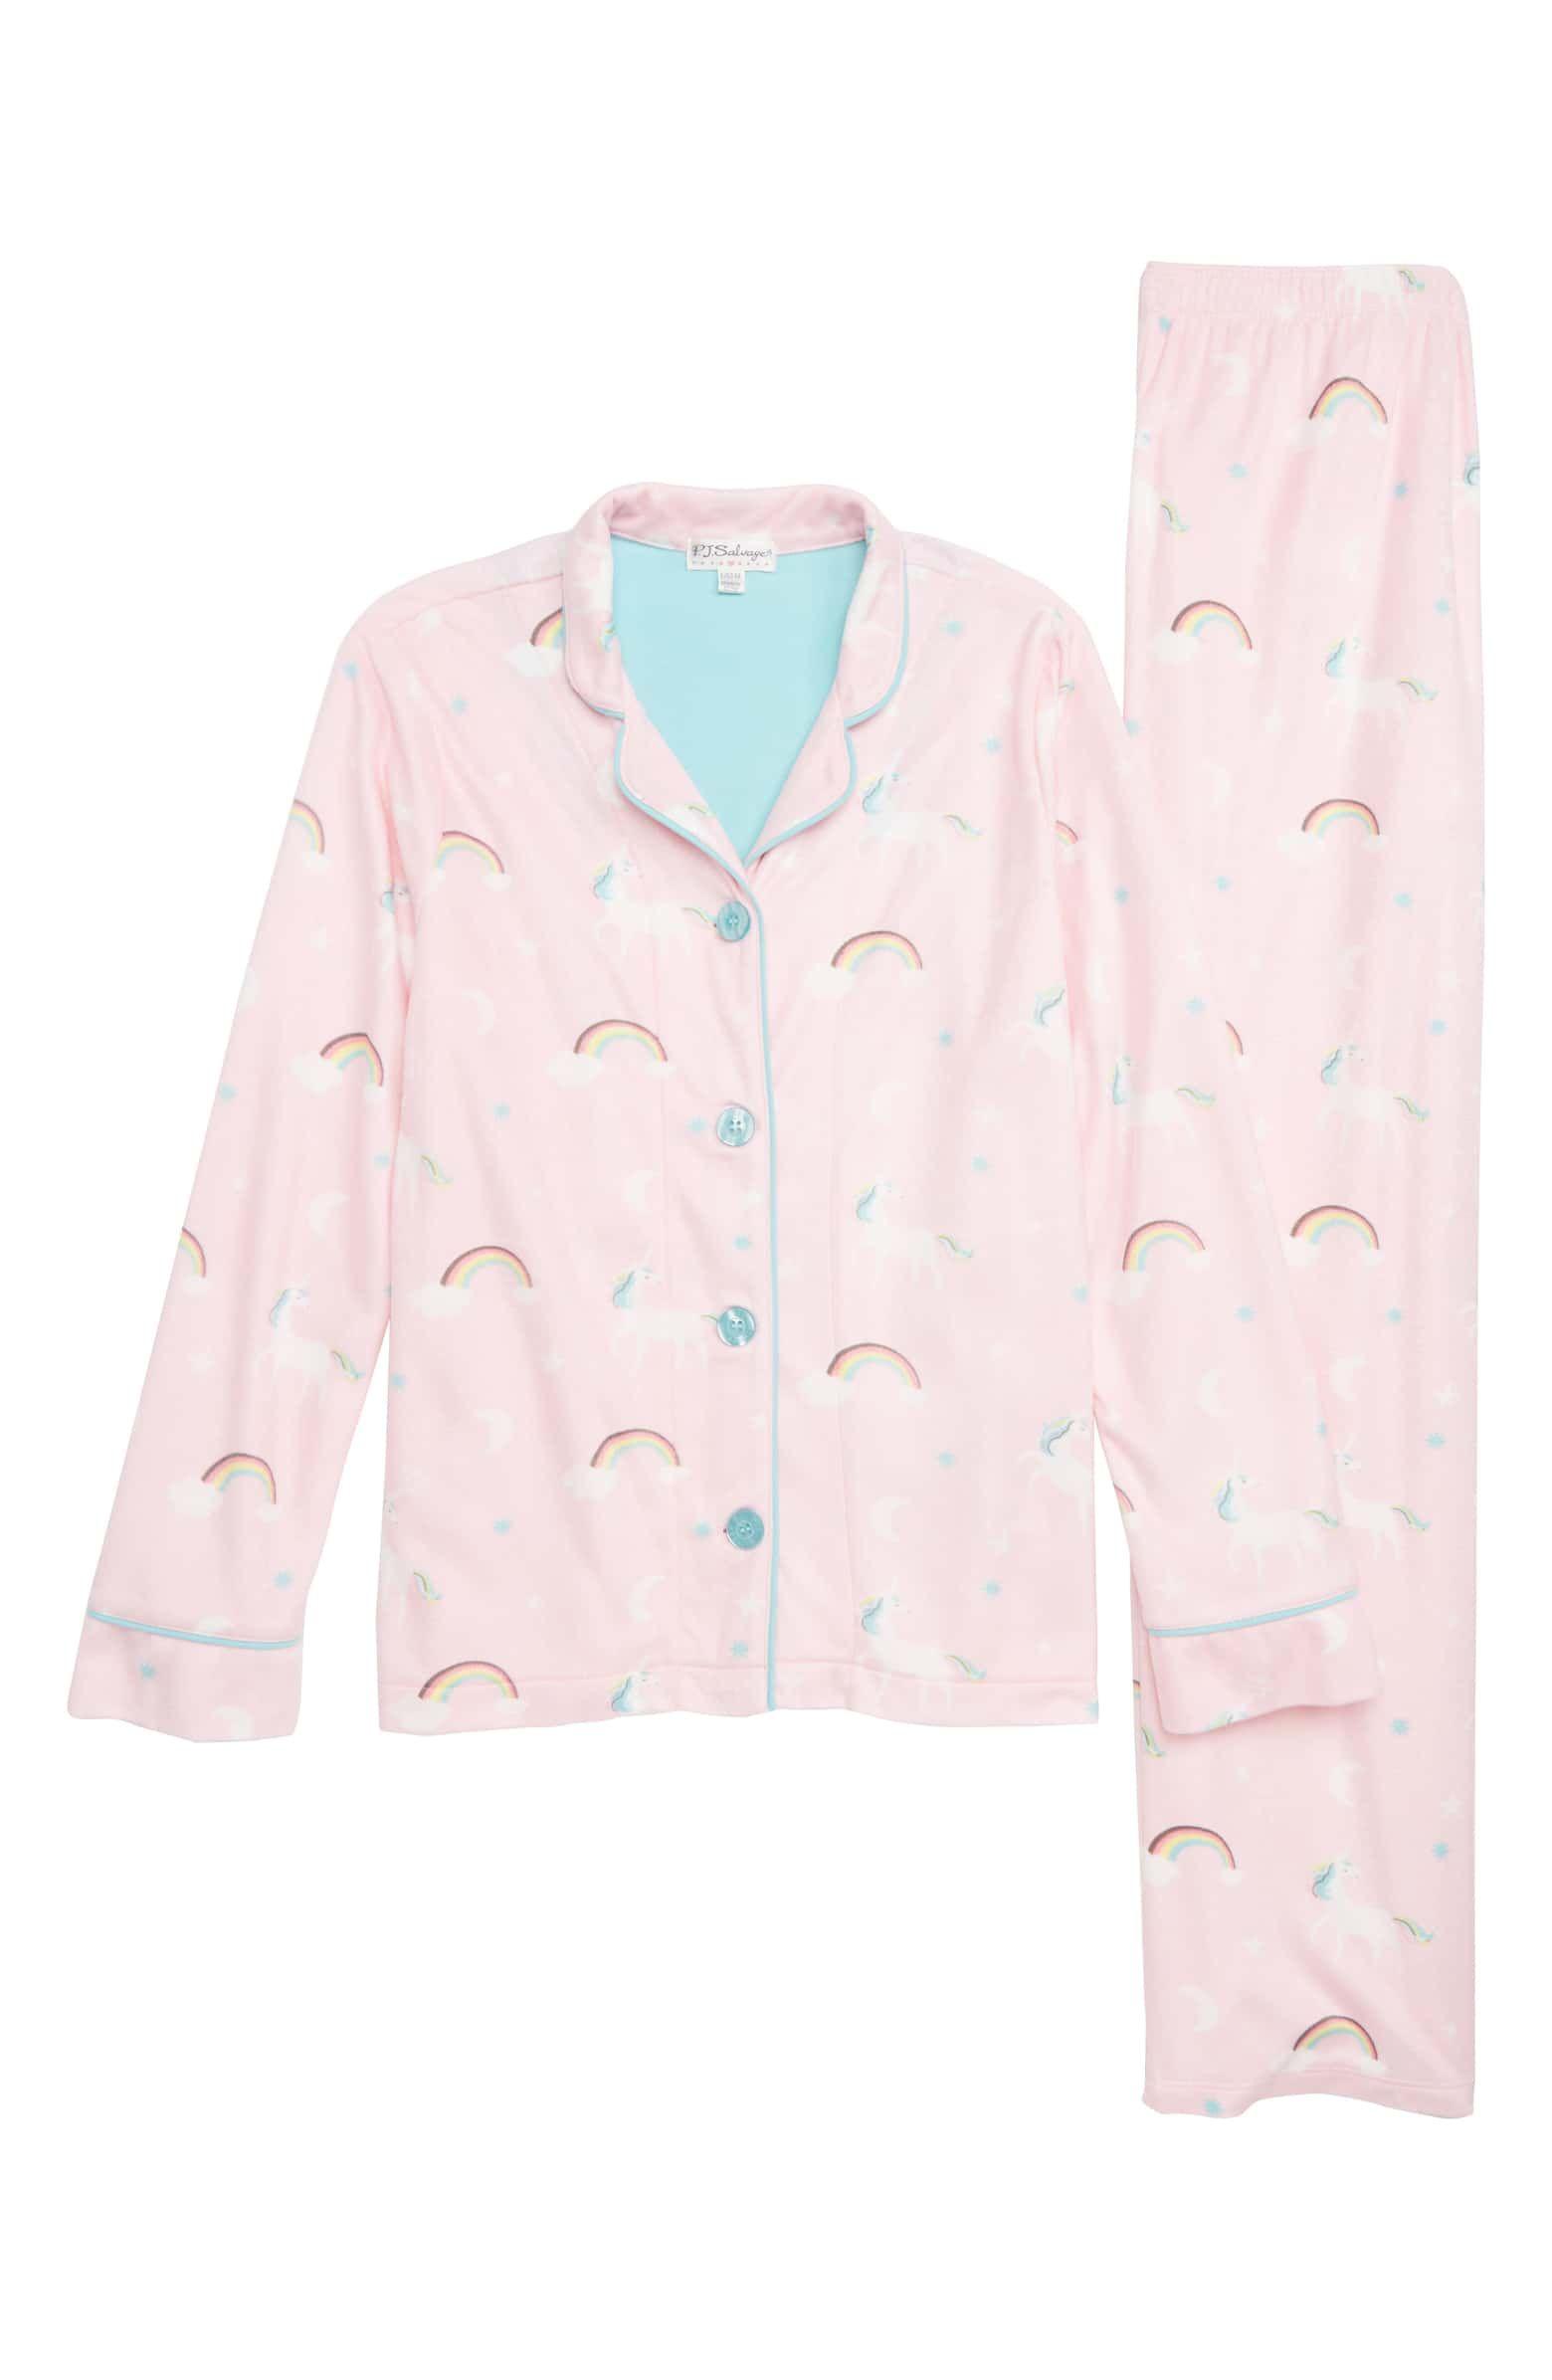 b1526bcee One of a Kind Pajamas